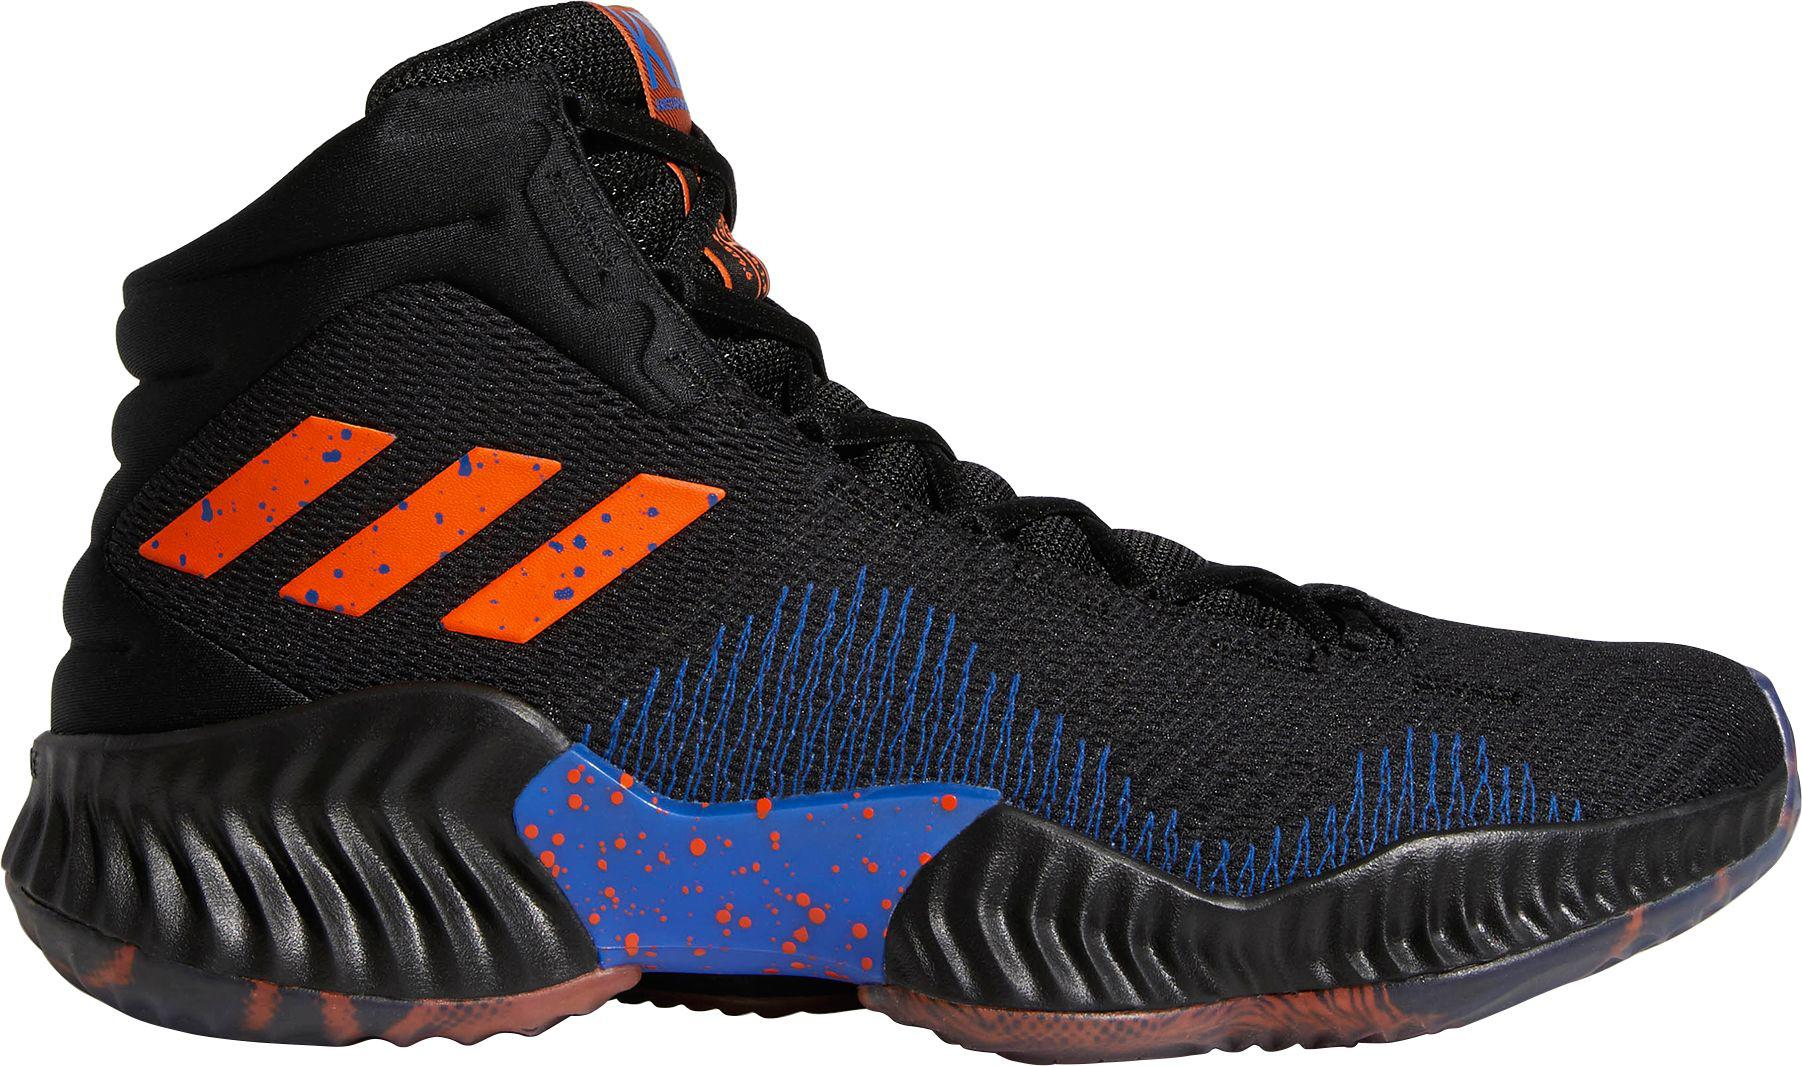 Pro Bounce 2018 Basketball Shoes